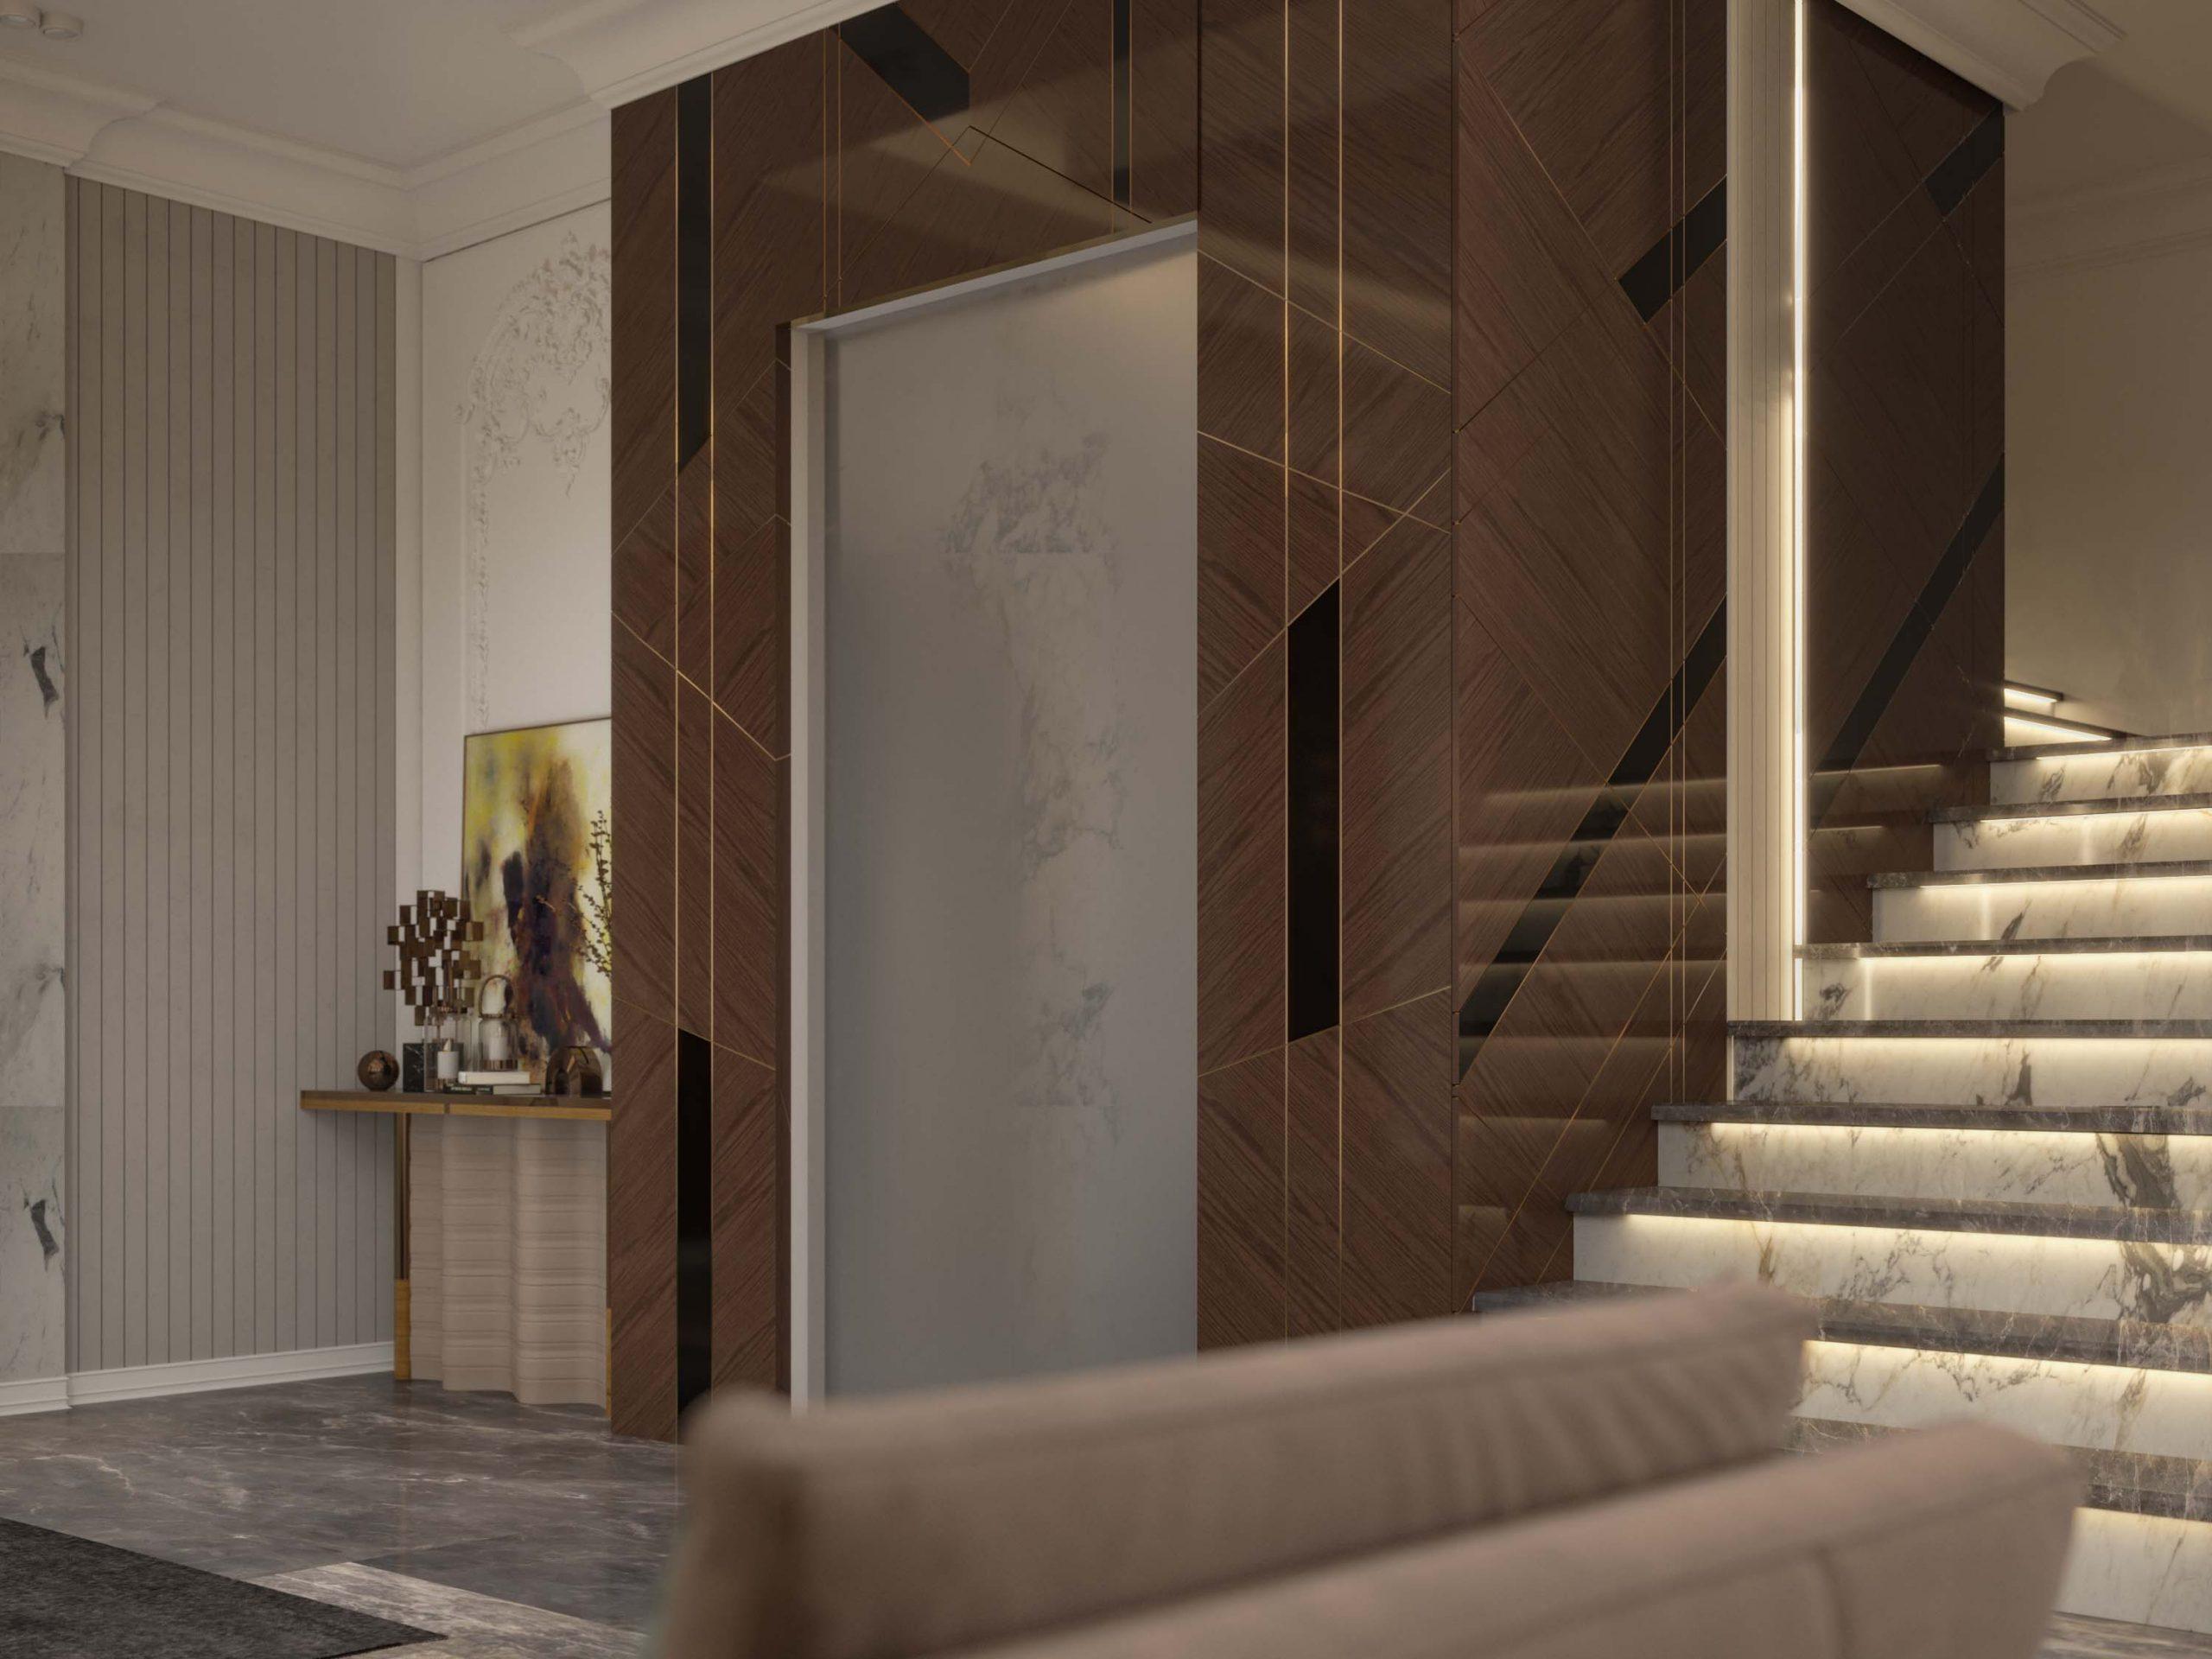 elevator - stairs - sala